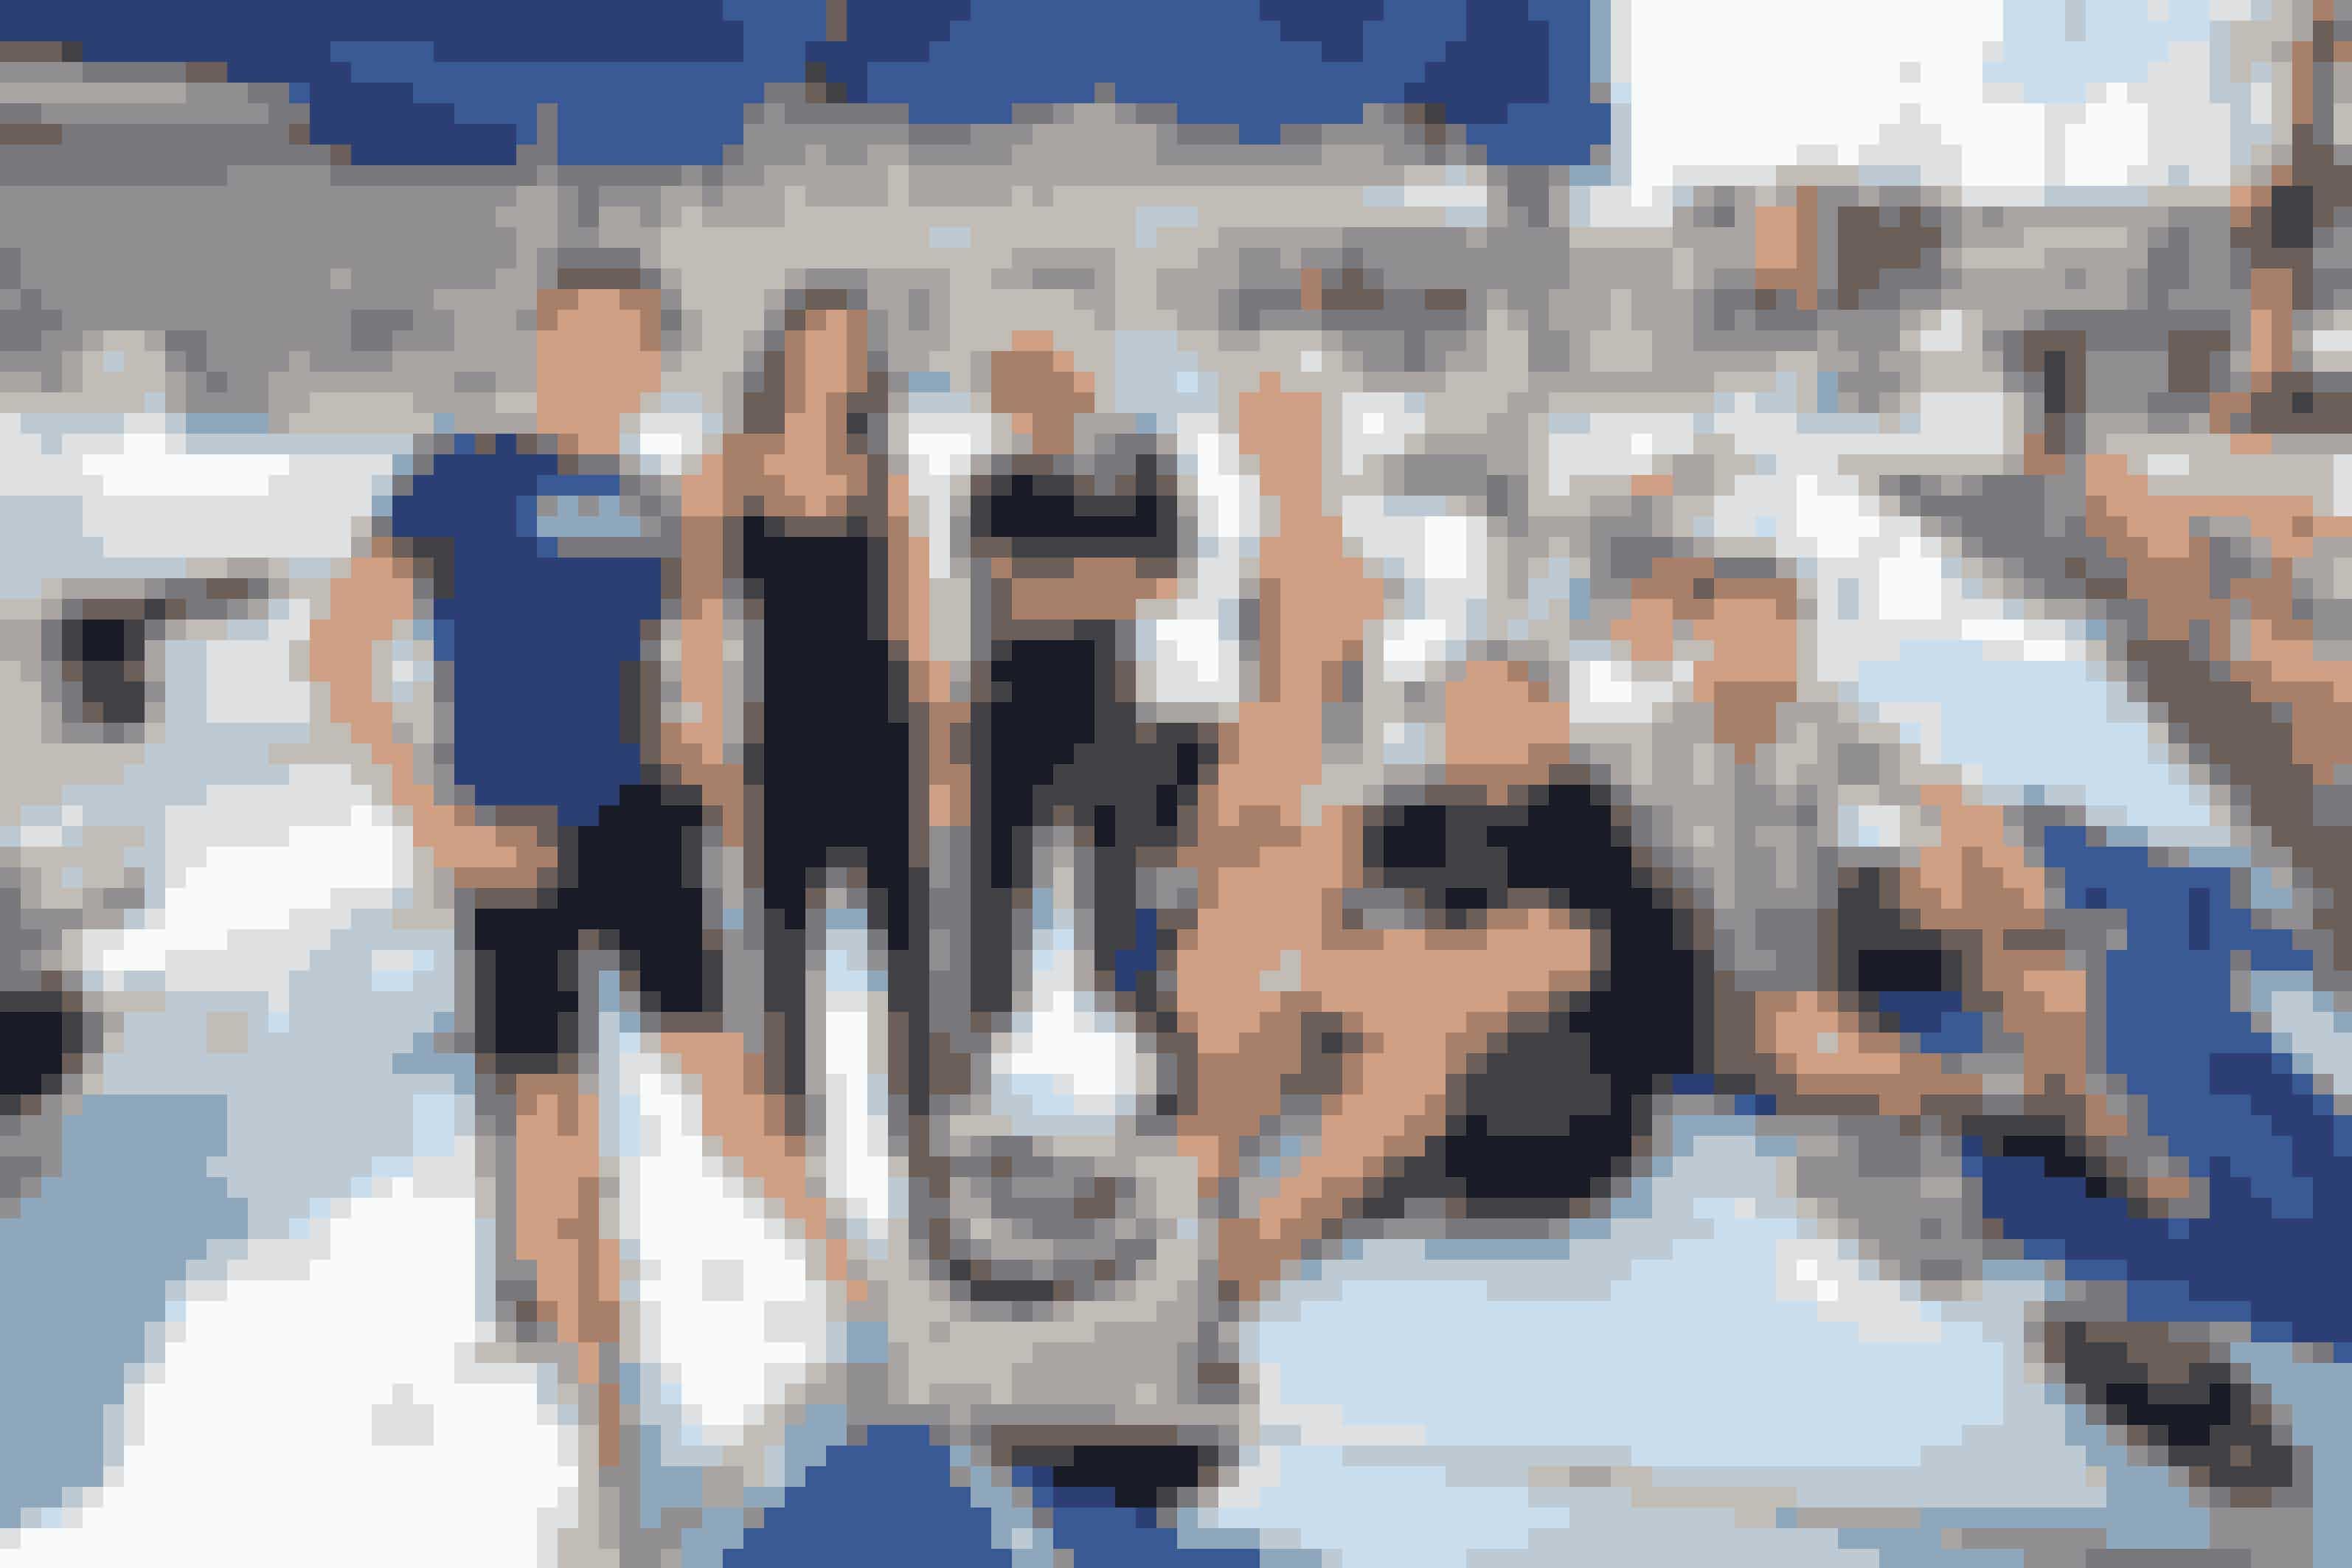 "De syv deltagere i Kanal 5-programmet ""Over Atlanten"". Fra venstre er det Nicolaj Kopernikus, Sus Wilkins, Hella Joof, Christel Pixi, Peter Falktoft og Gorm Wisweh."